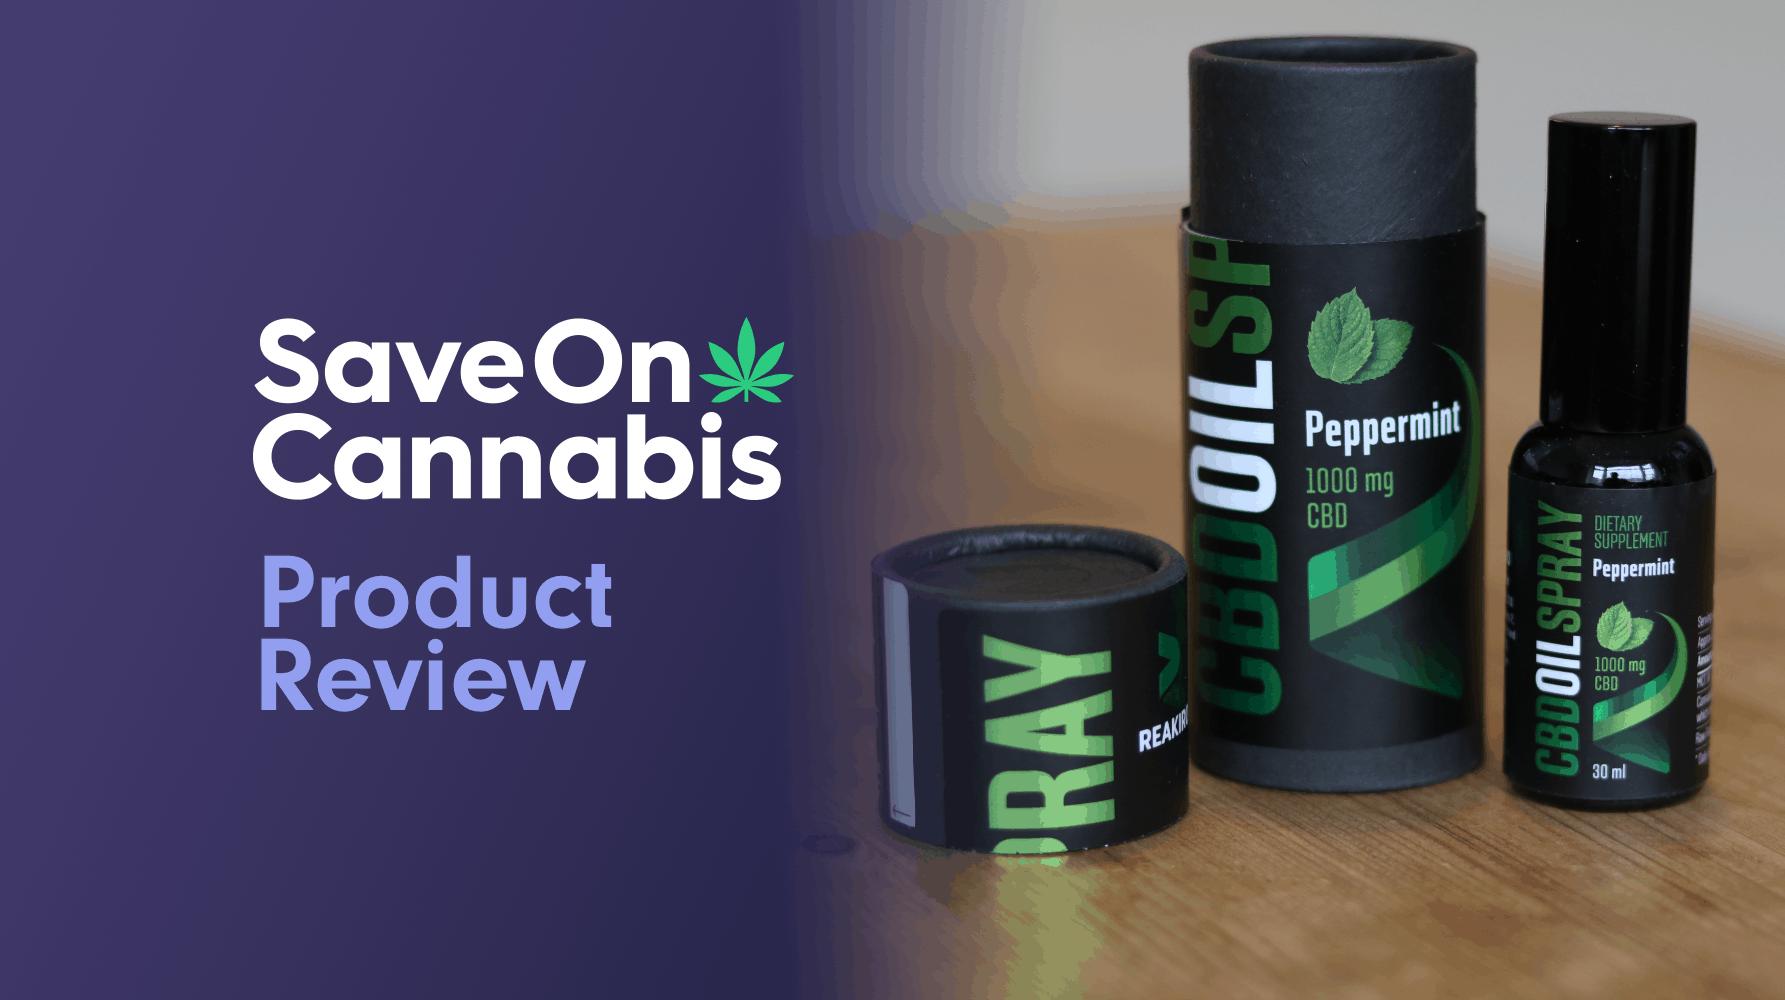 Reakiro CBD Oil Spray Peppermint Save On Cannabis Review Website